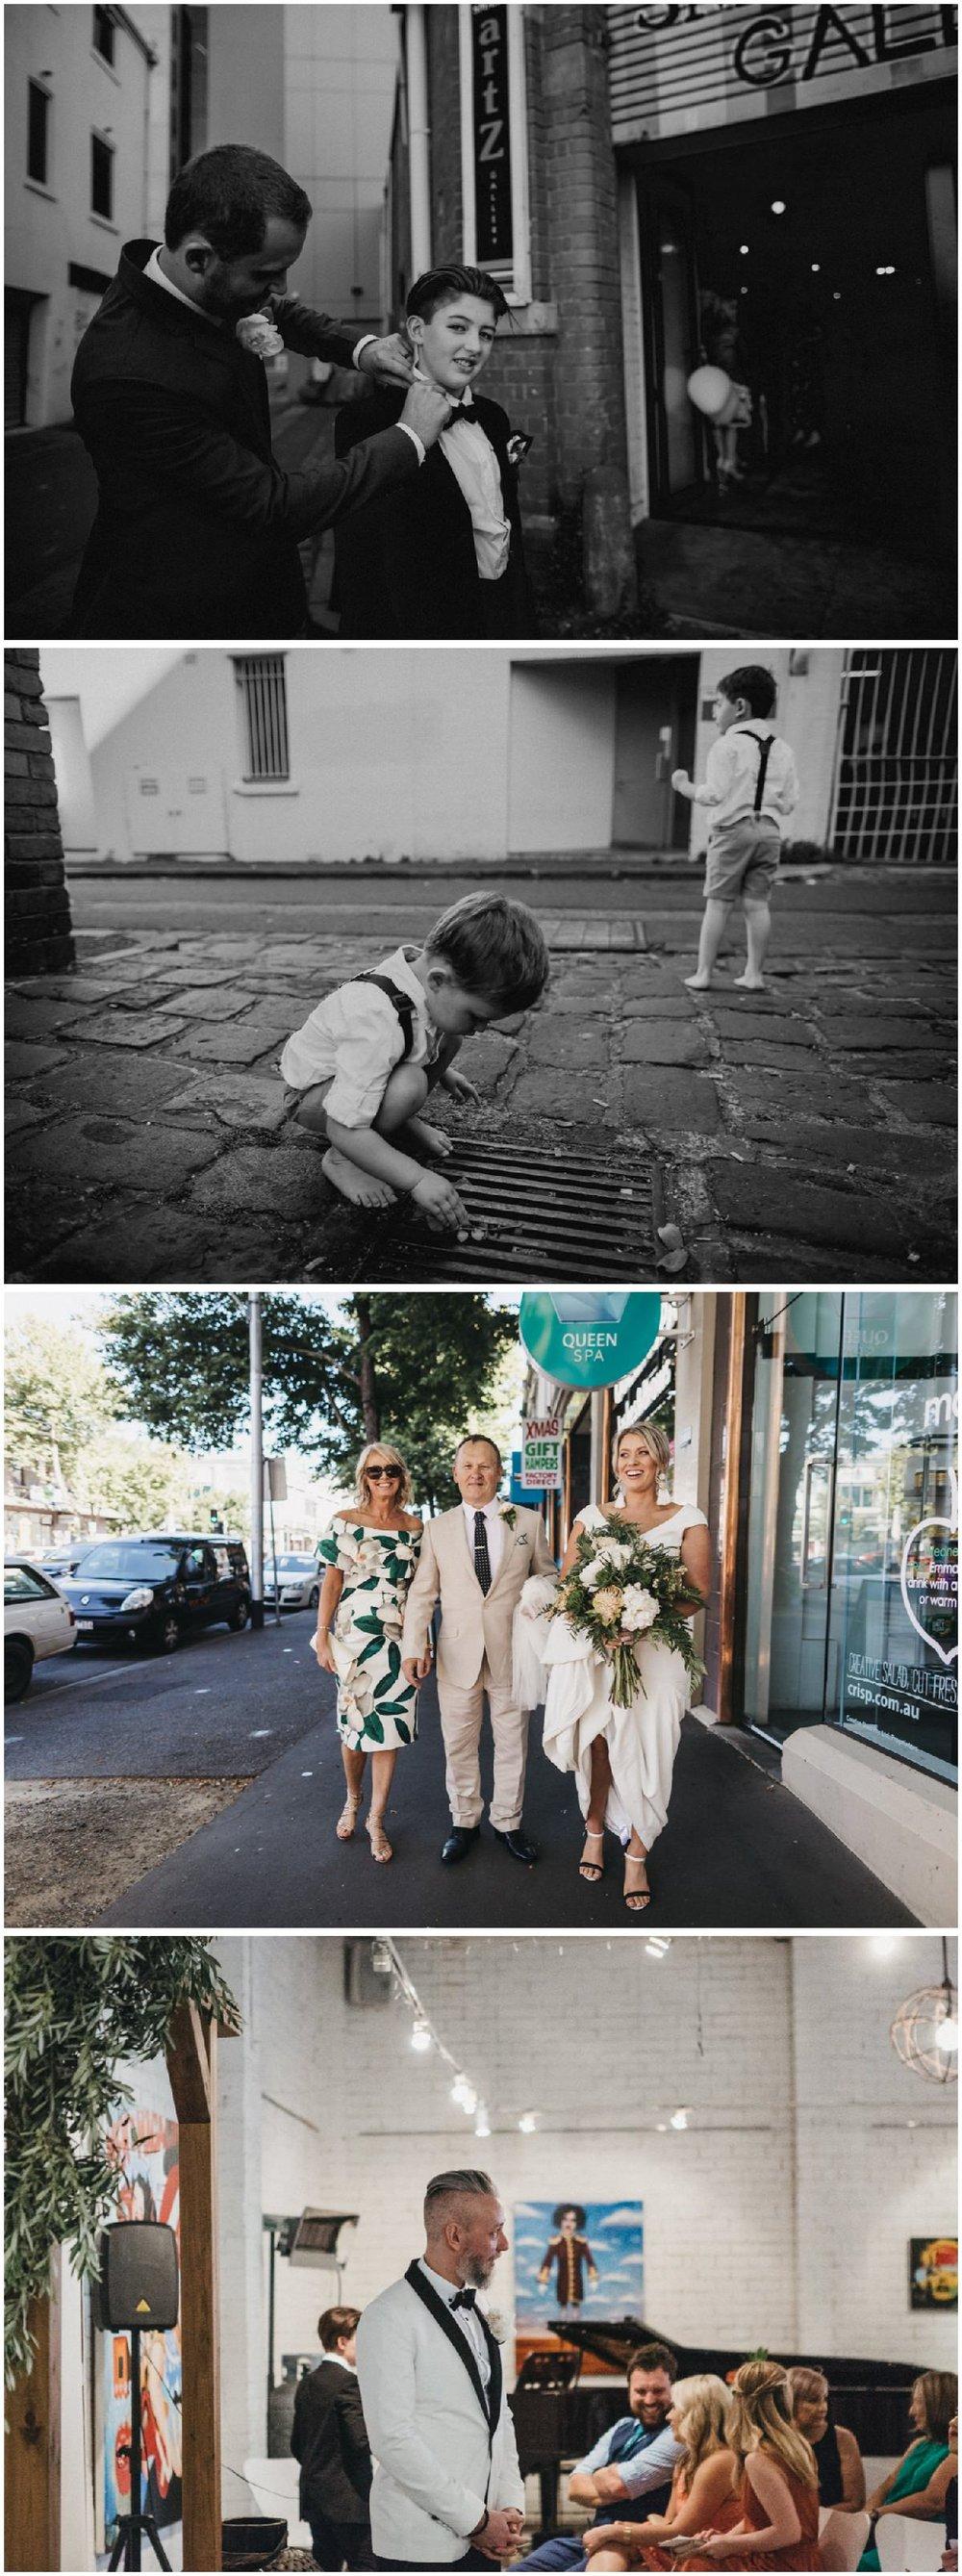 Emily_Tim_Melbourne_Beach_city_wedding_090.jpg